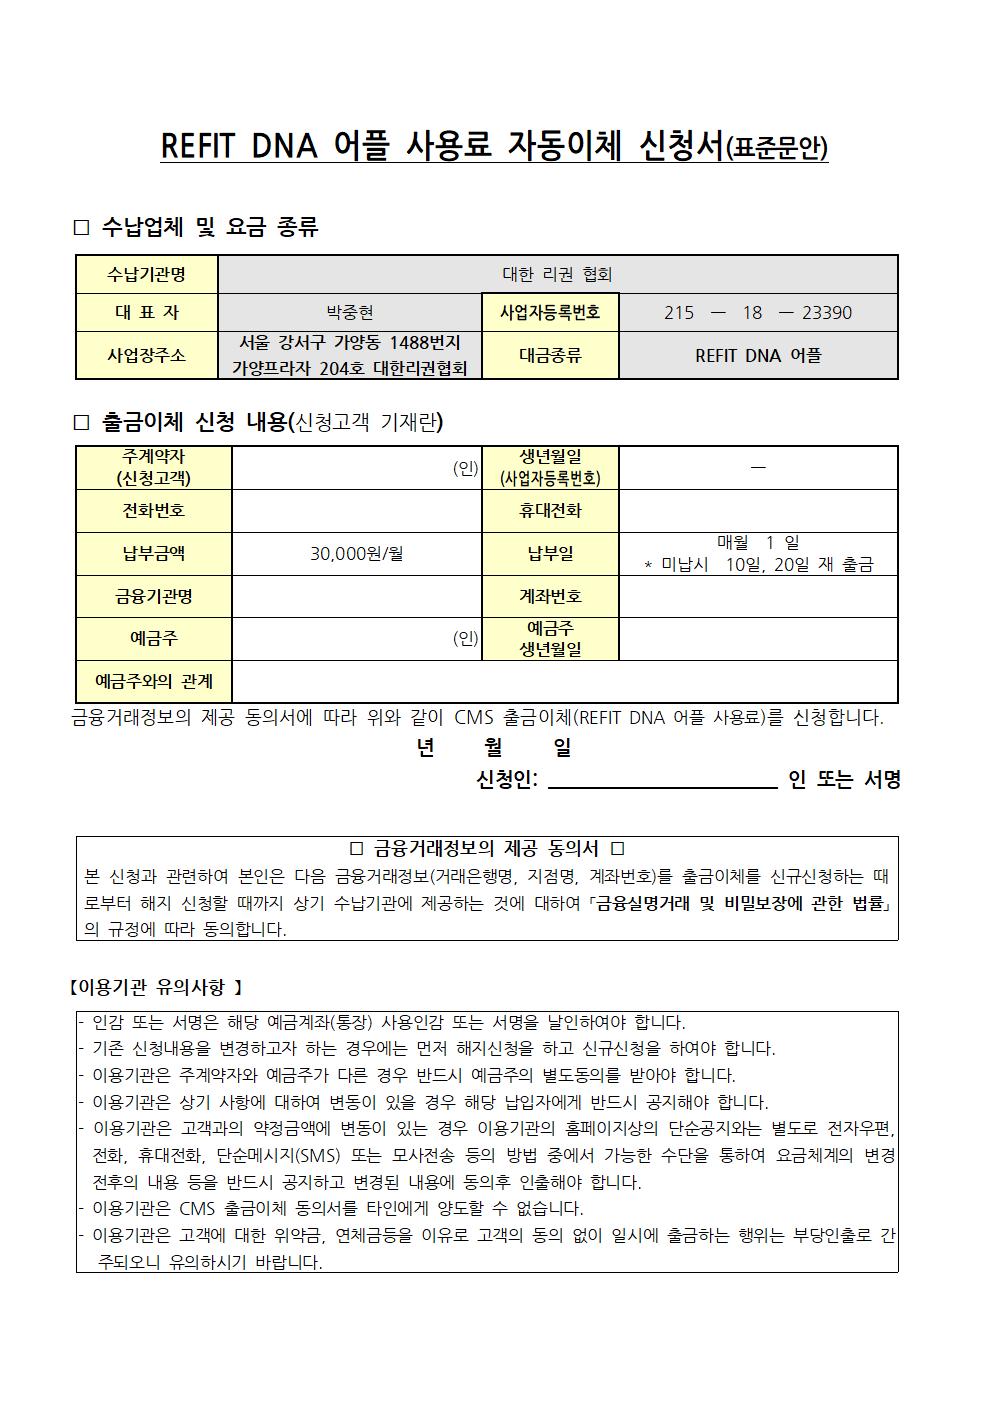 REFITDNA어플CMS출금이체신청서(표준문안)001.png